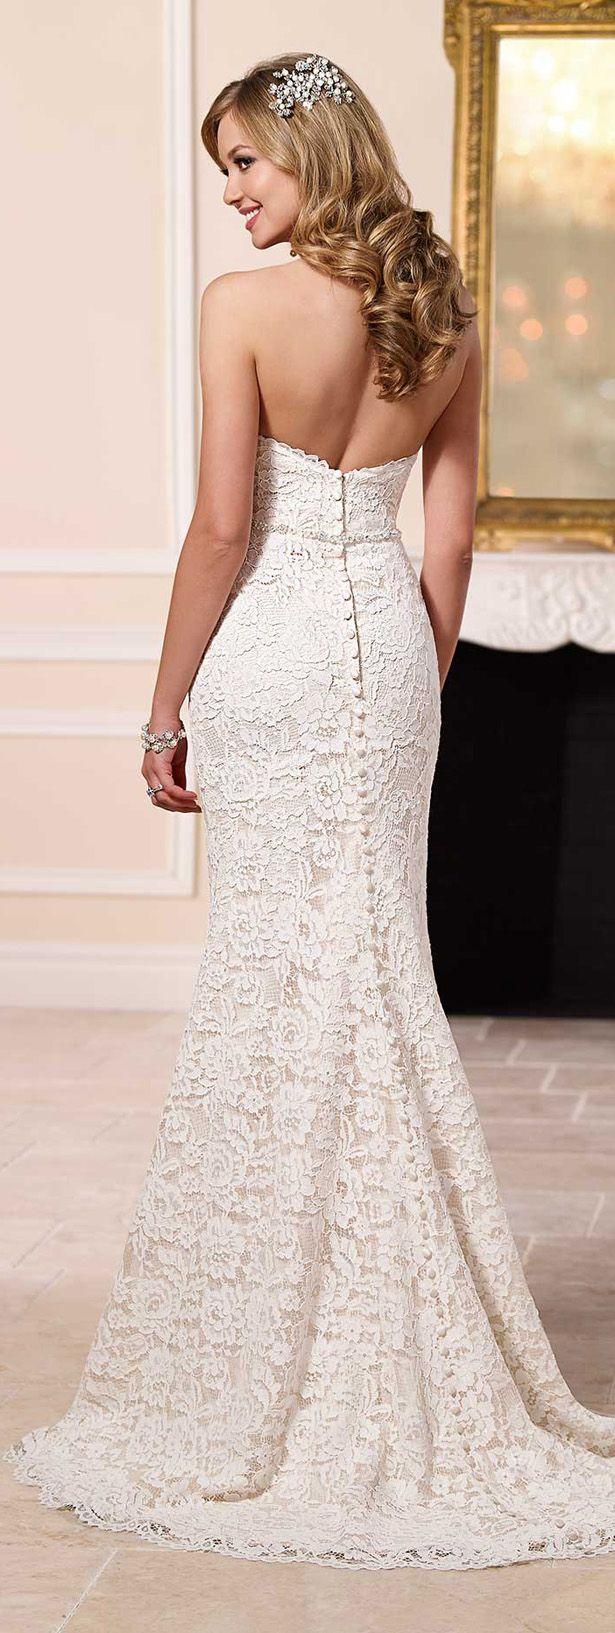 Stella York Spring 2016 Wedding Dress _23